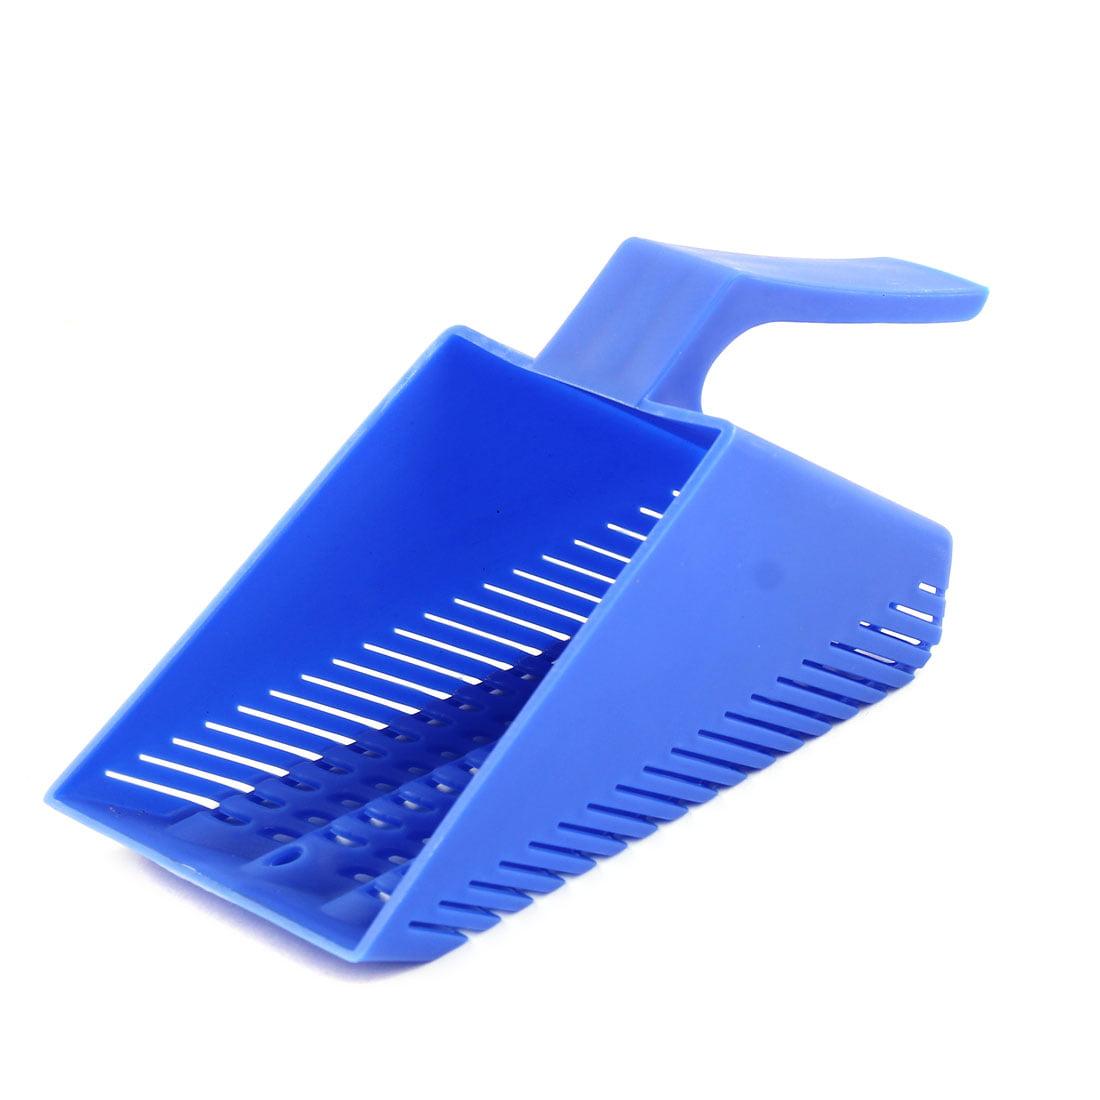 Fish Tank Plastic Hand Held Scraper Gravel Cleaner Cleaning Tool Sand Scoop